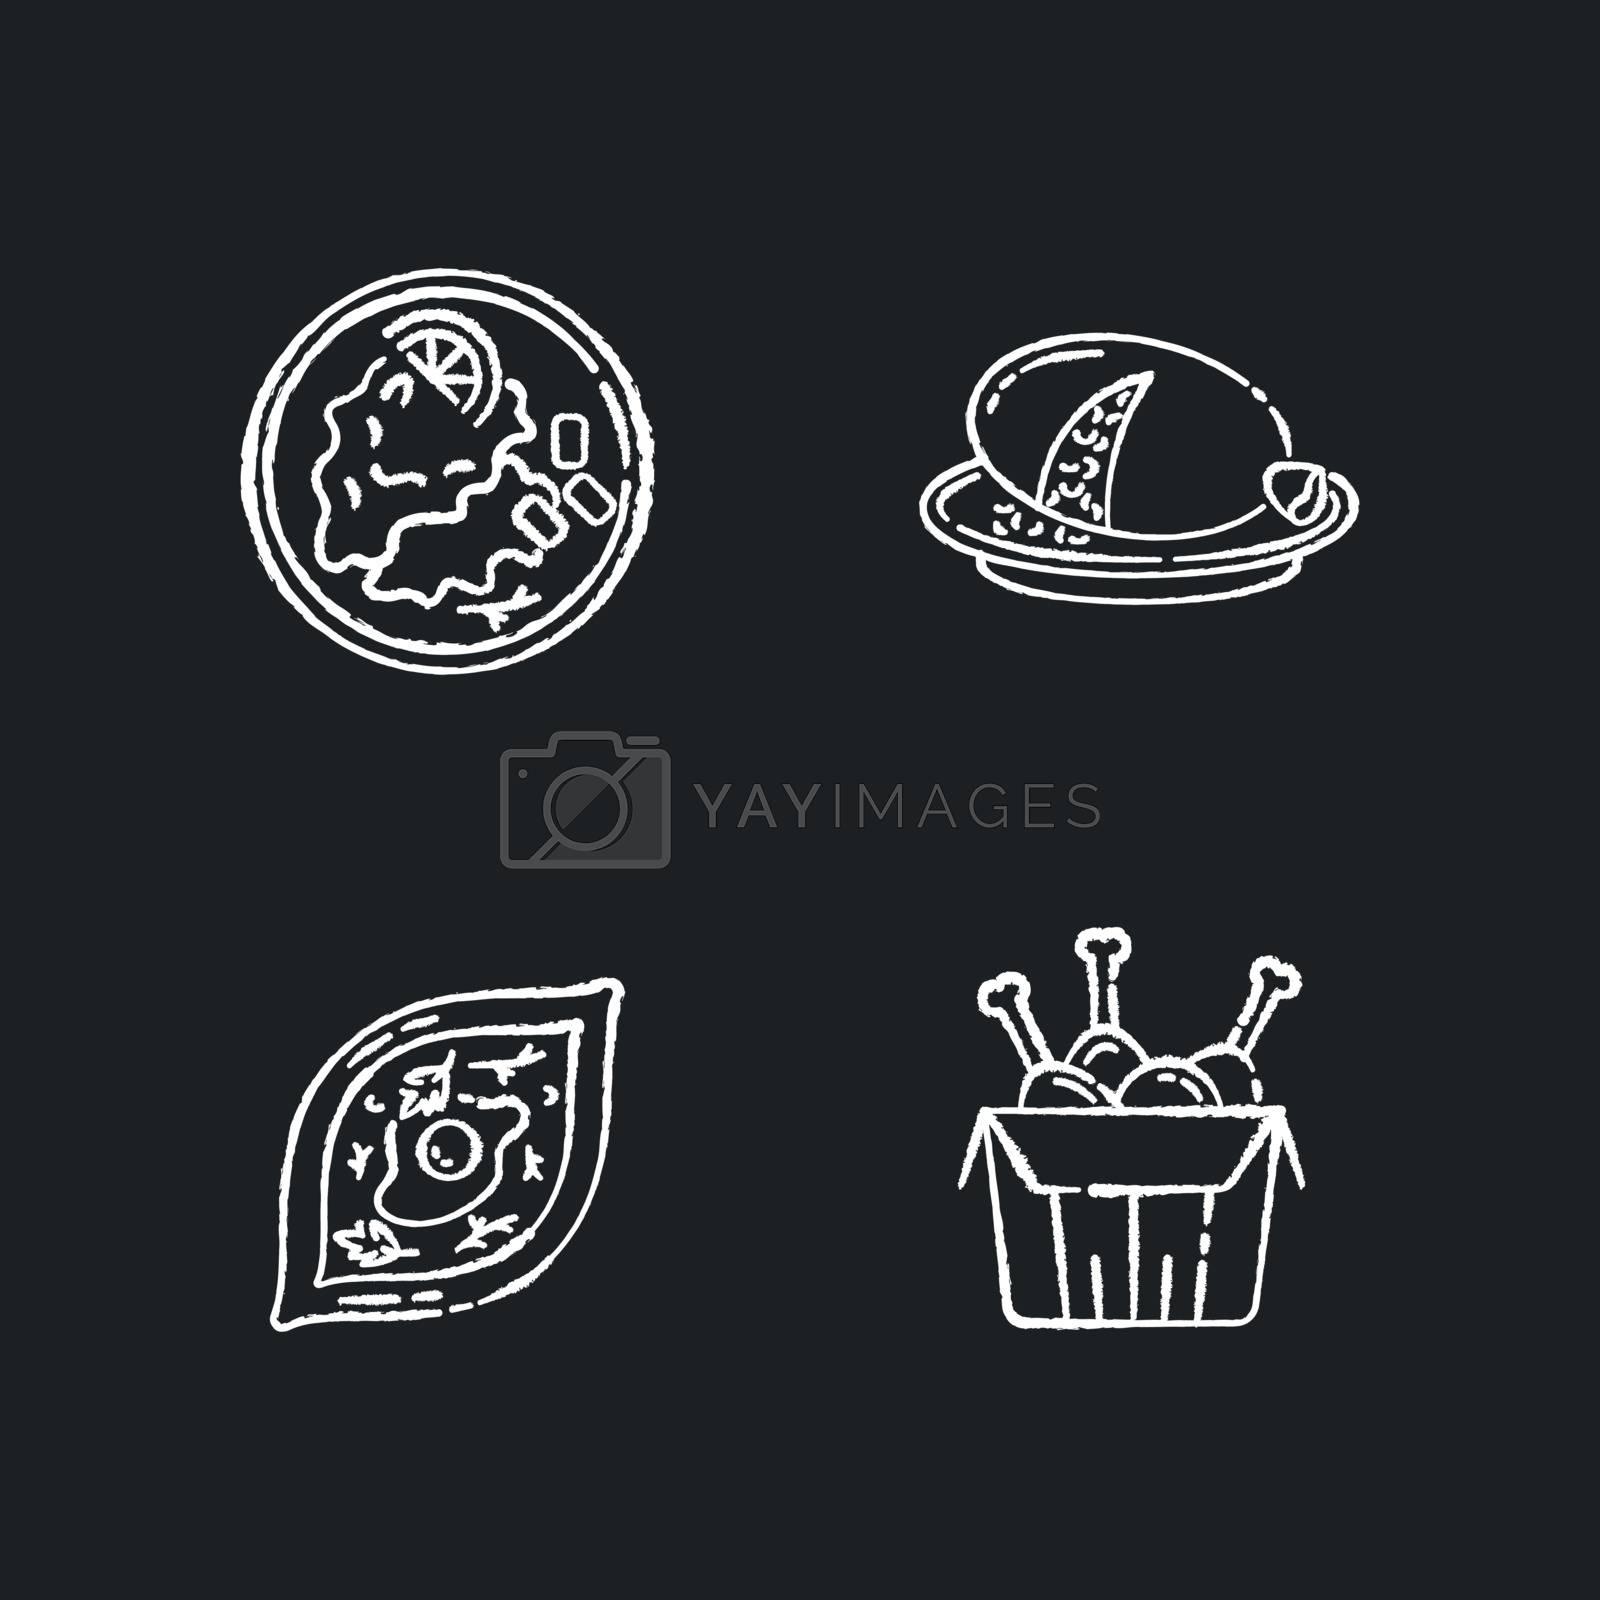 Fast food chalk white icons set on black background. Scottish haggis. Wiener schnitzel. Georgian khachapuri. Tandoori chicken. Fried junk food. Isolated vector chalkboard illustrations